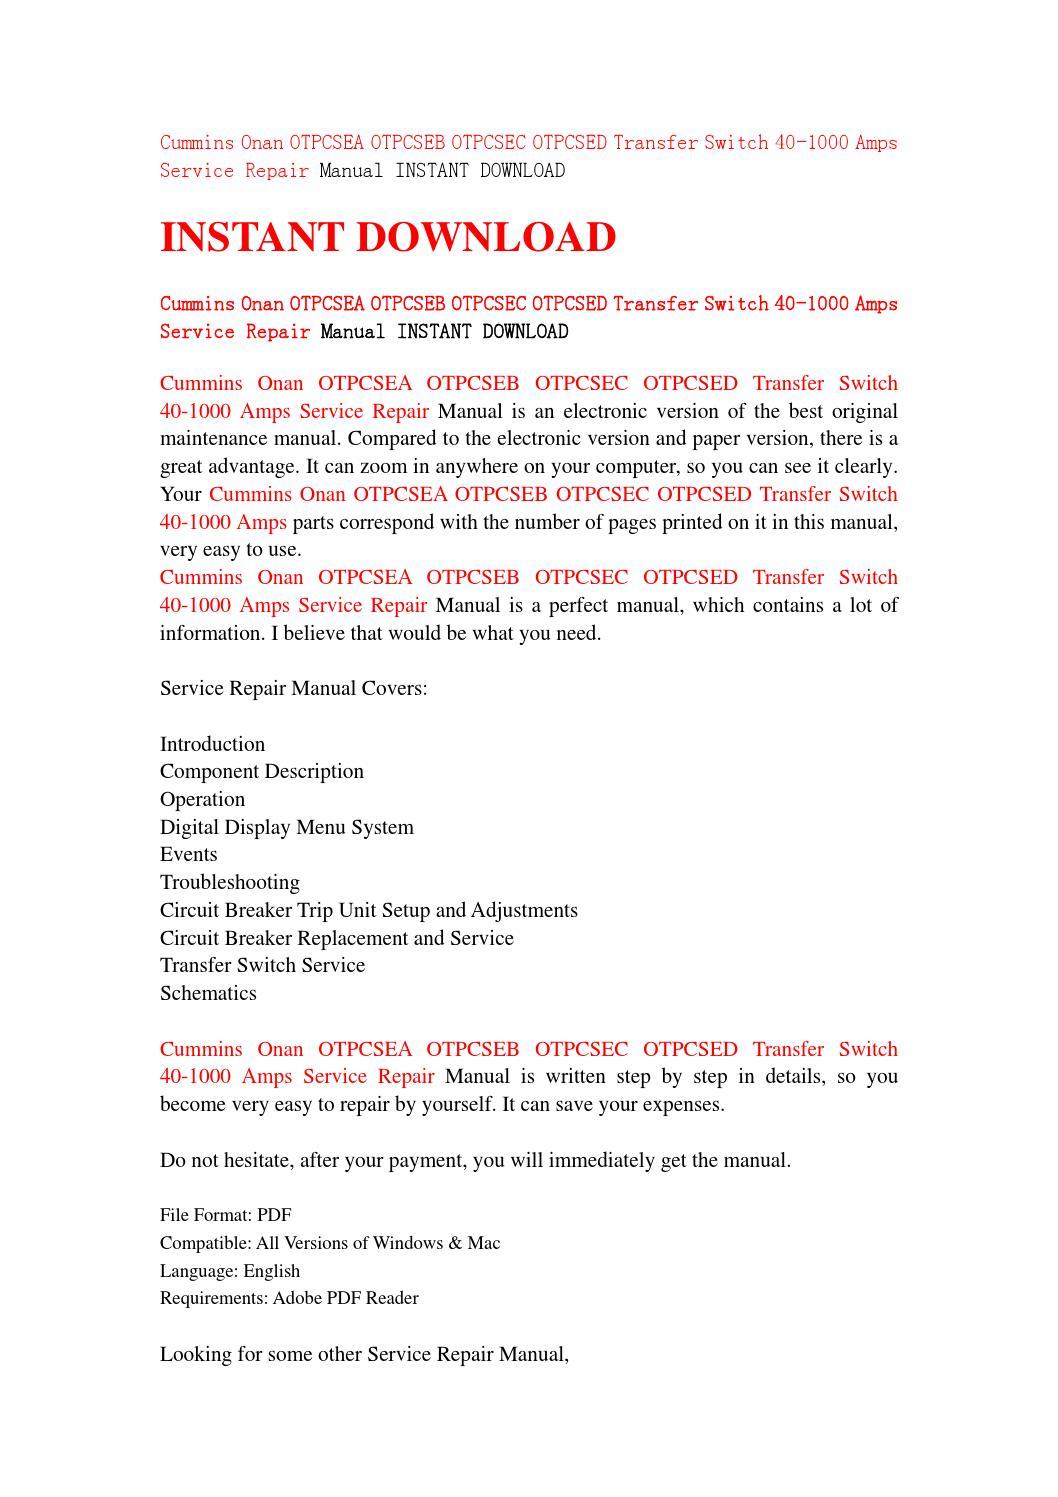 Cummins onan otpcsea otpcseb otpcsec otpcsed transfer switch 40 1000 amps  service repair manual inst by sfjehfsendf - issuu